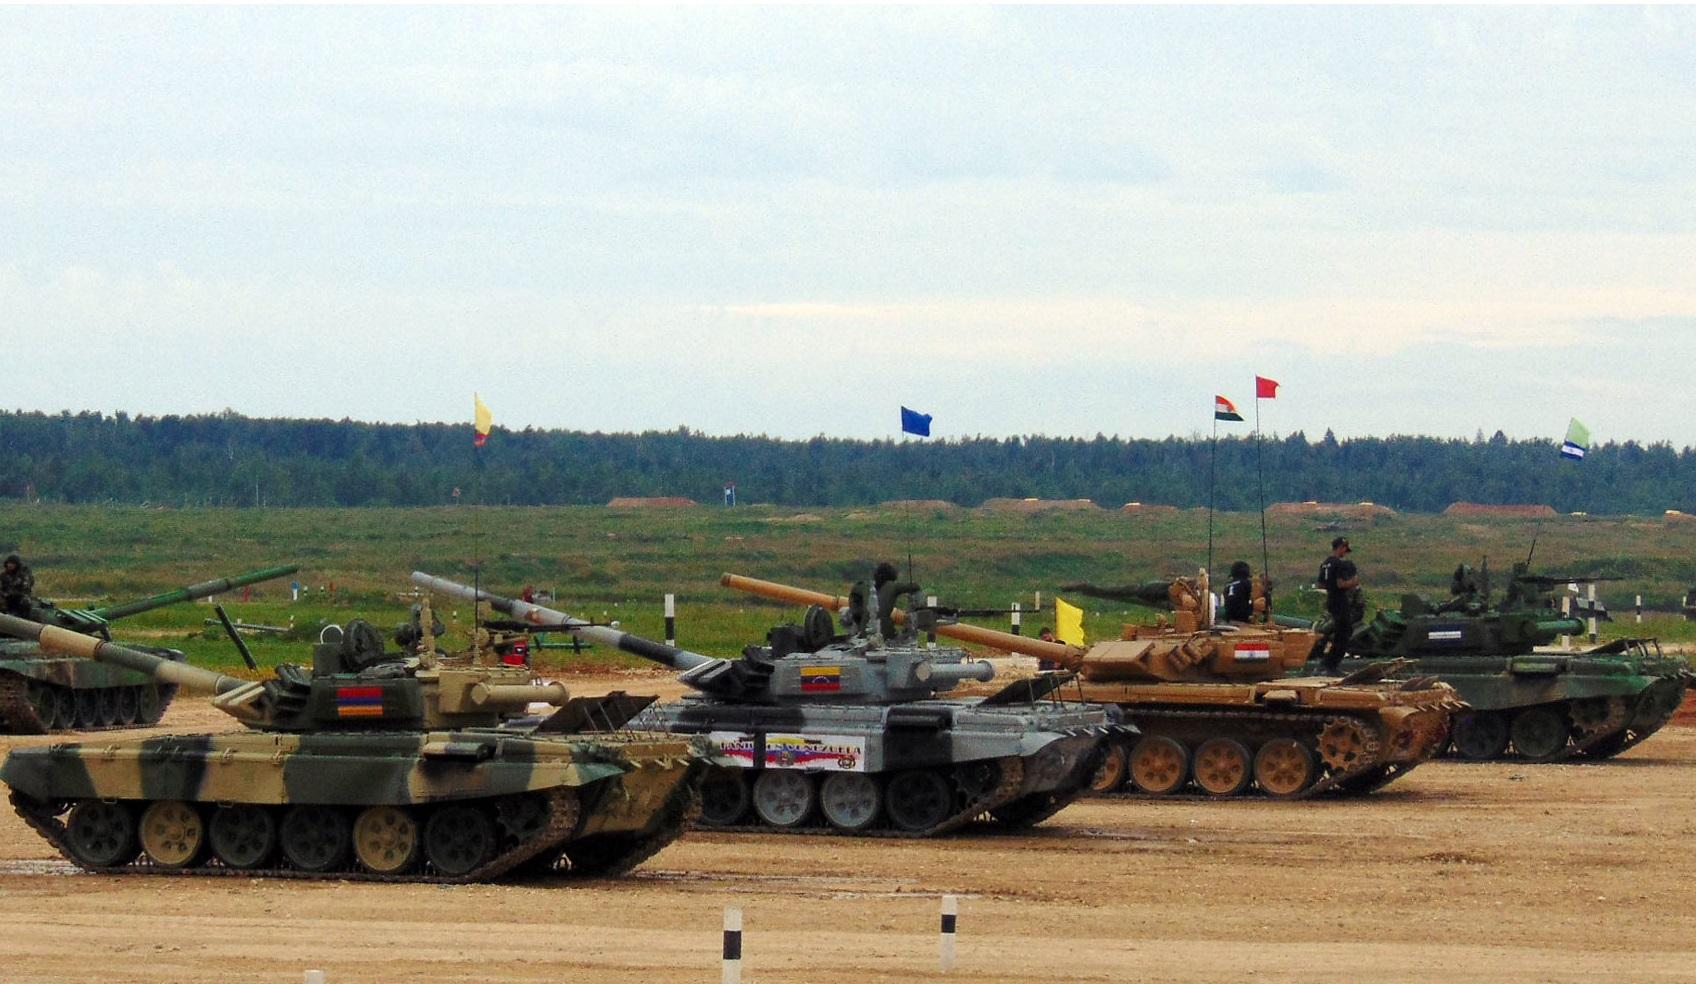 The International Army Games: Tank Biathlon